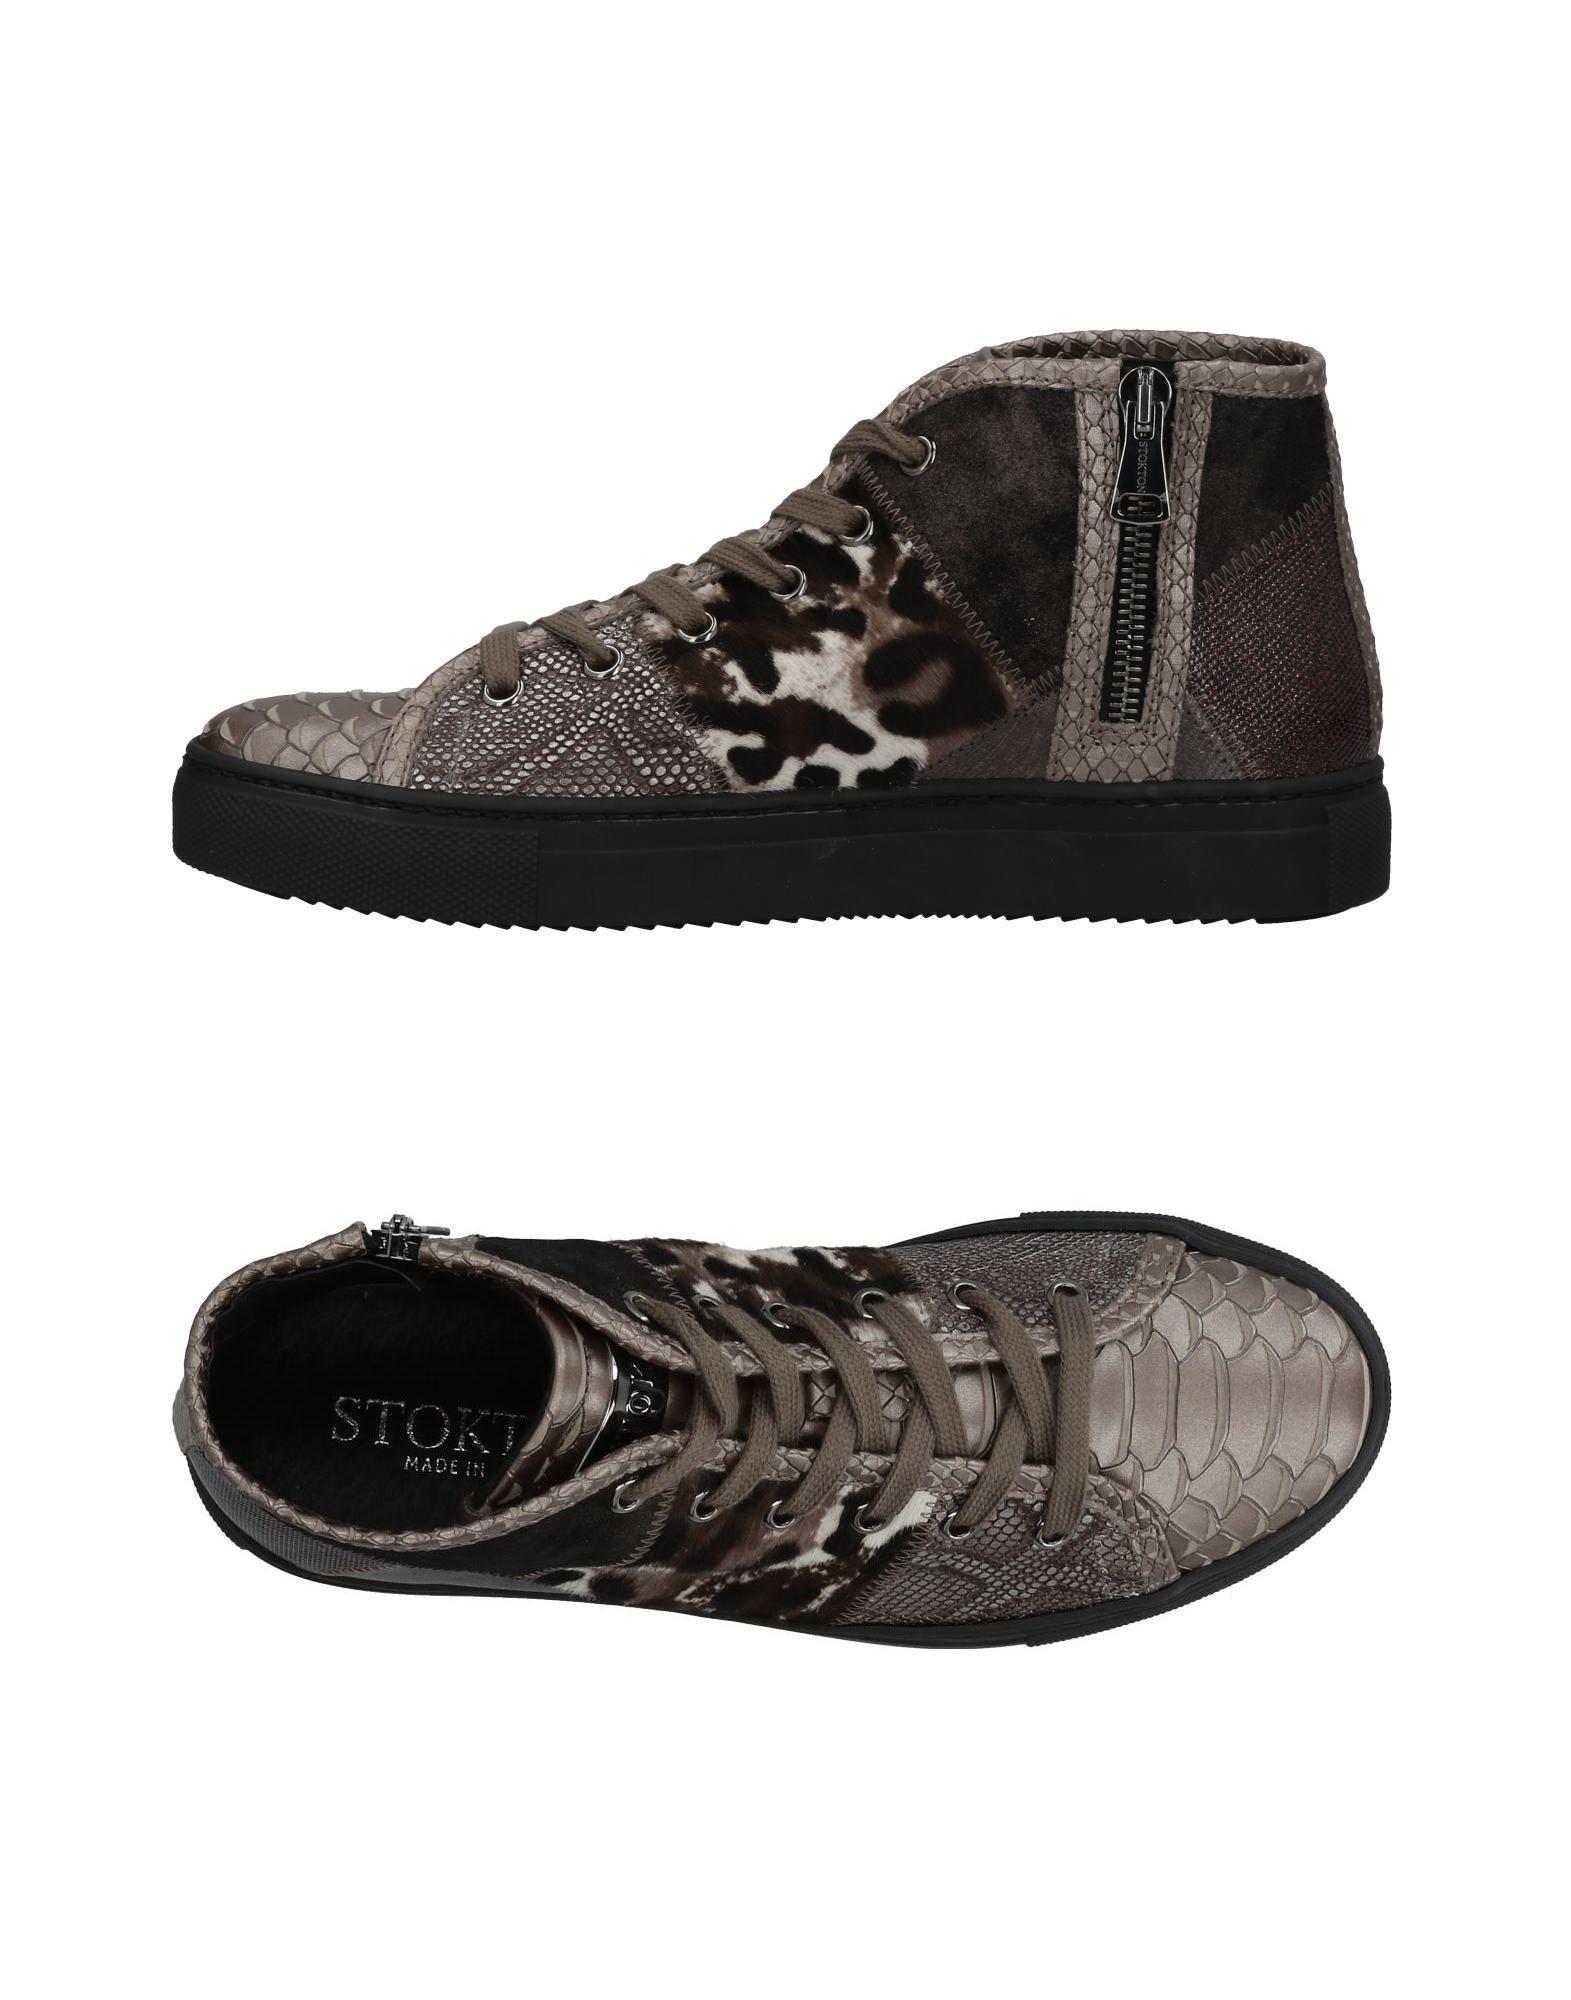 Stokton  Sneakers Damen  Stokton 11459958OP Heiße Schuhe 562045